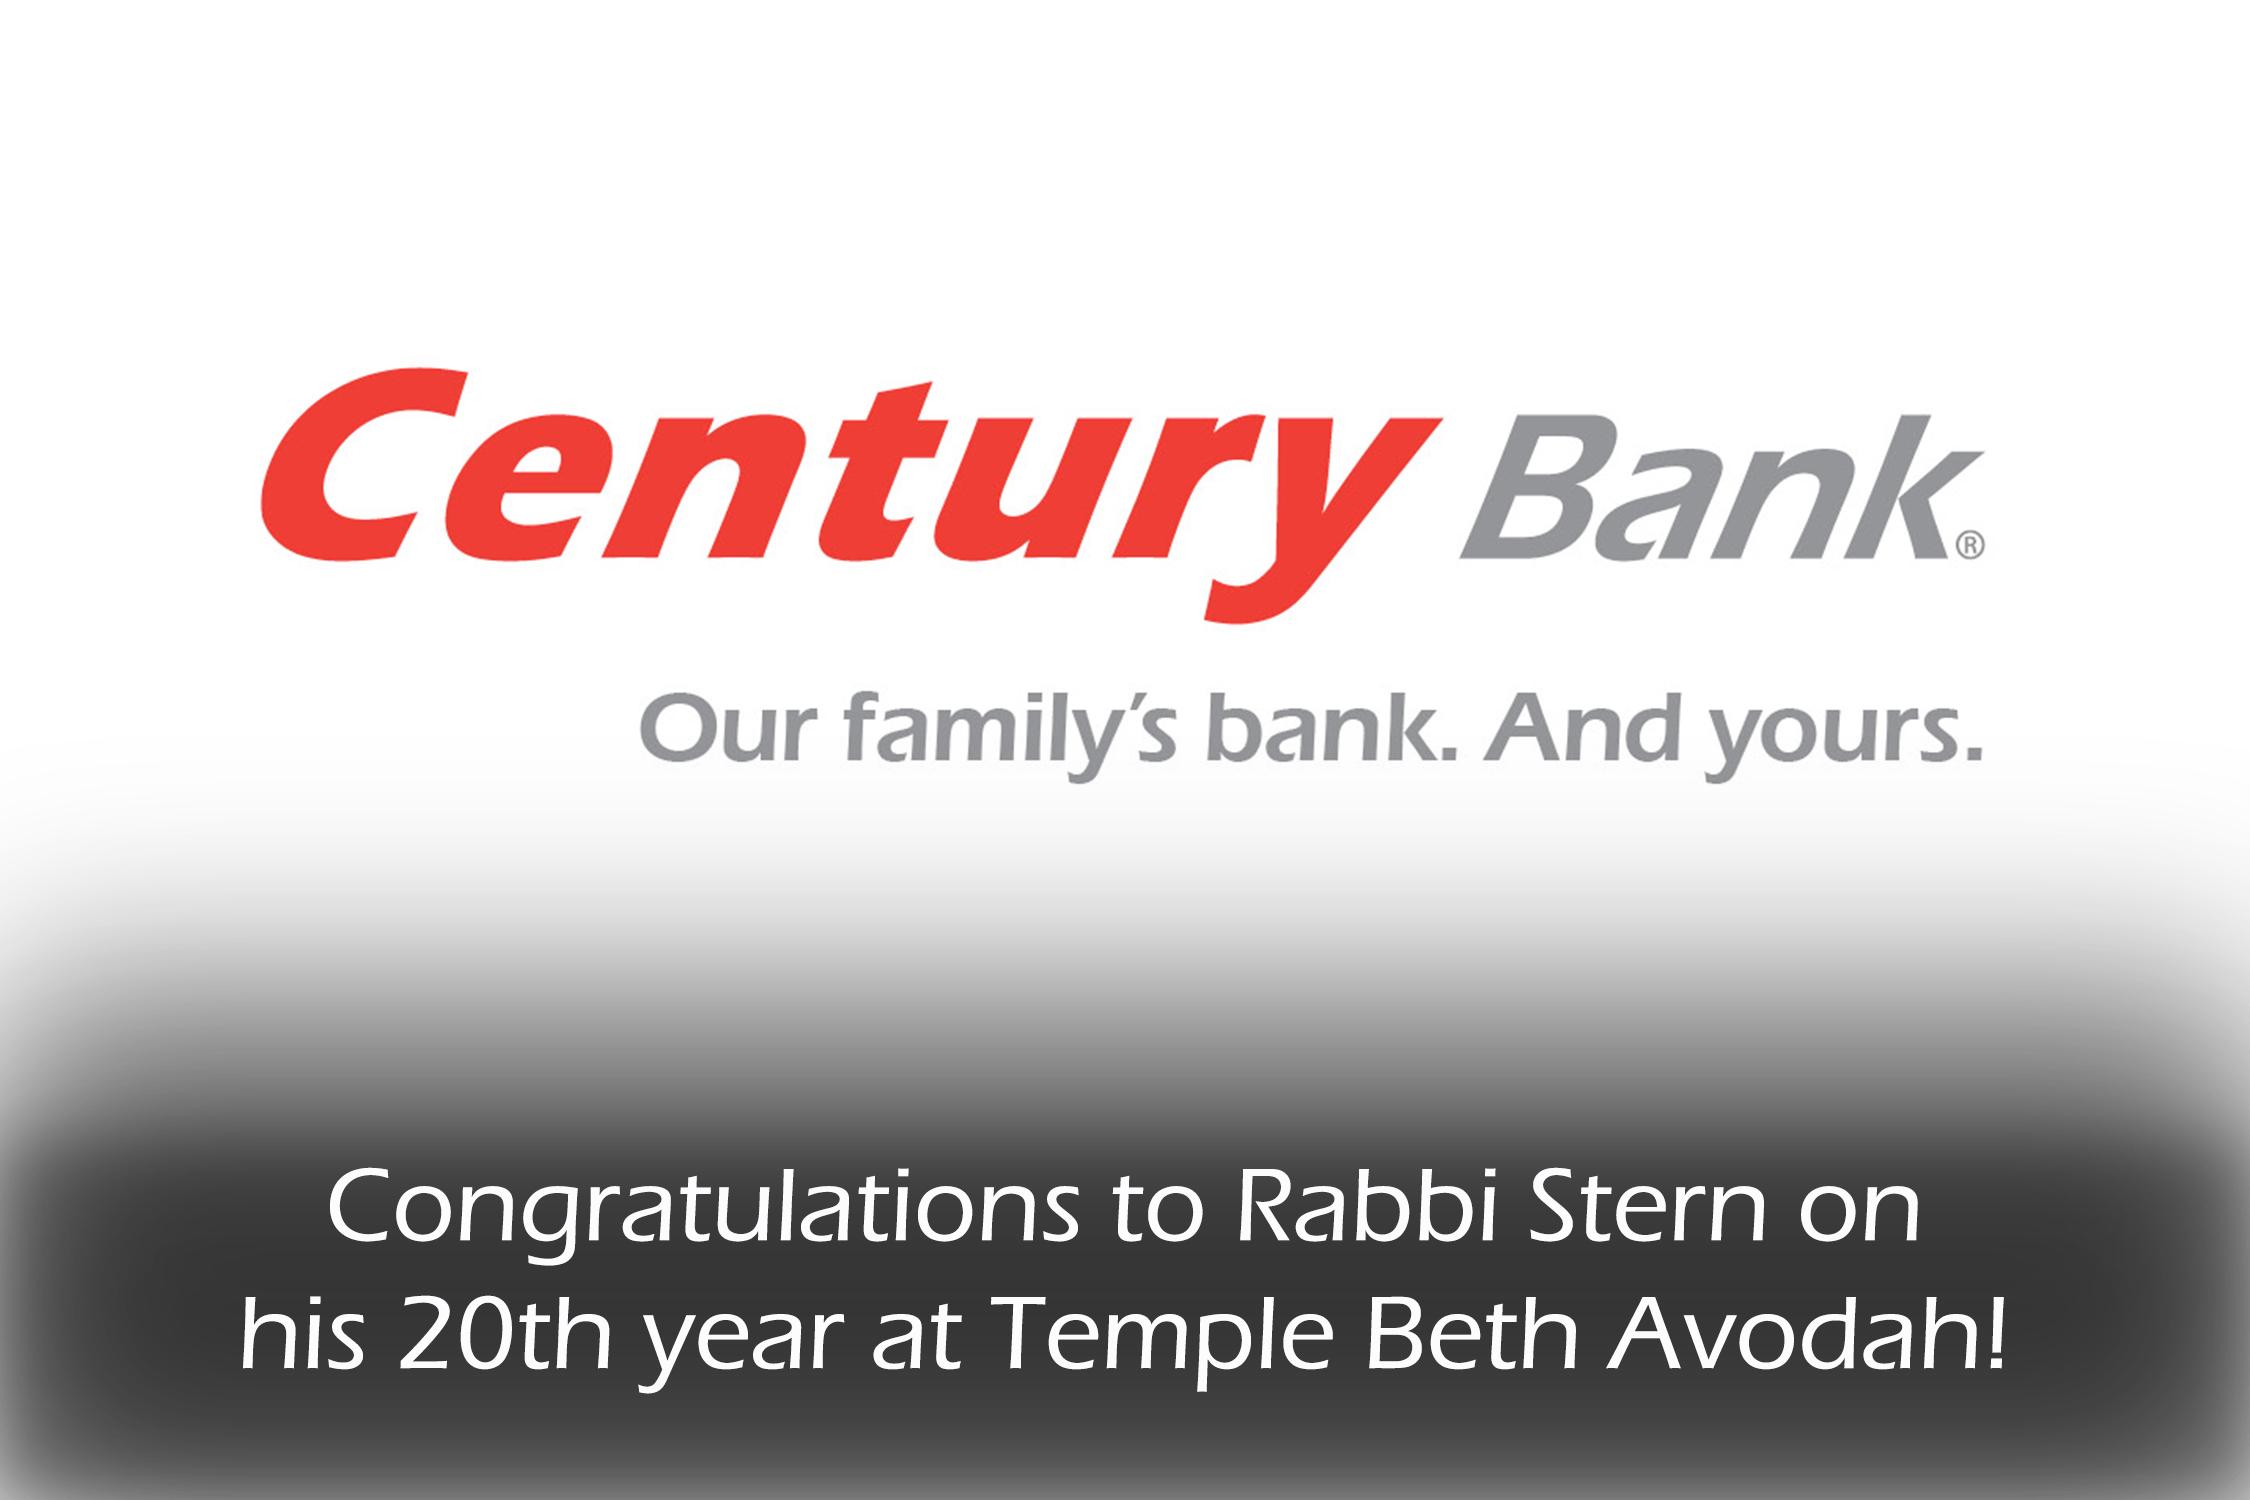 Century Bank